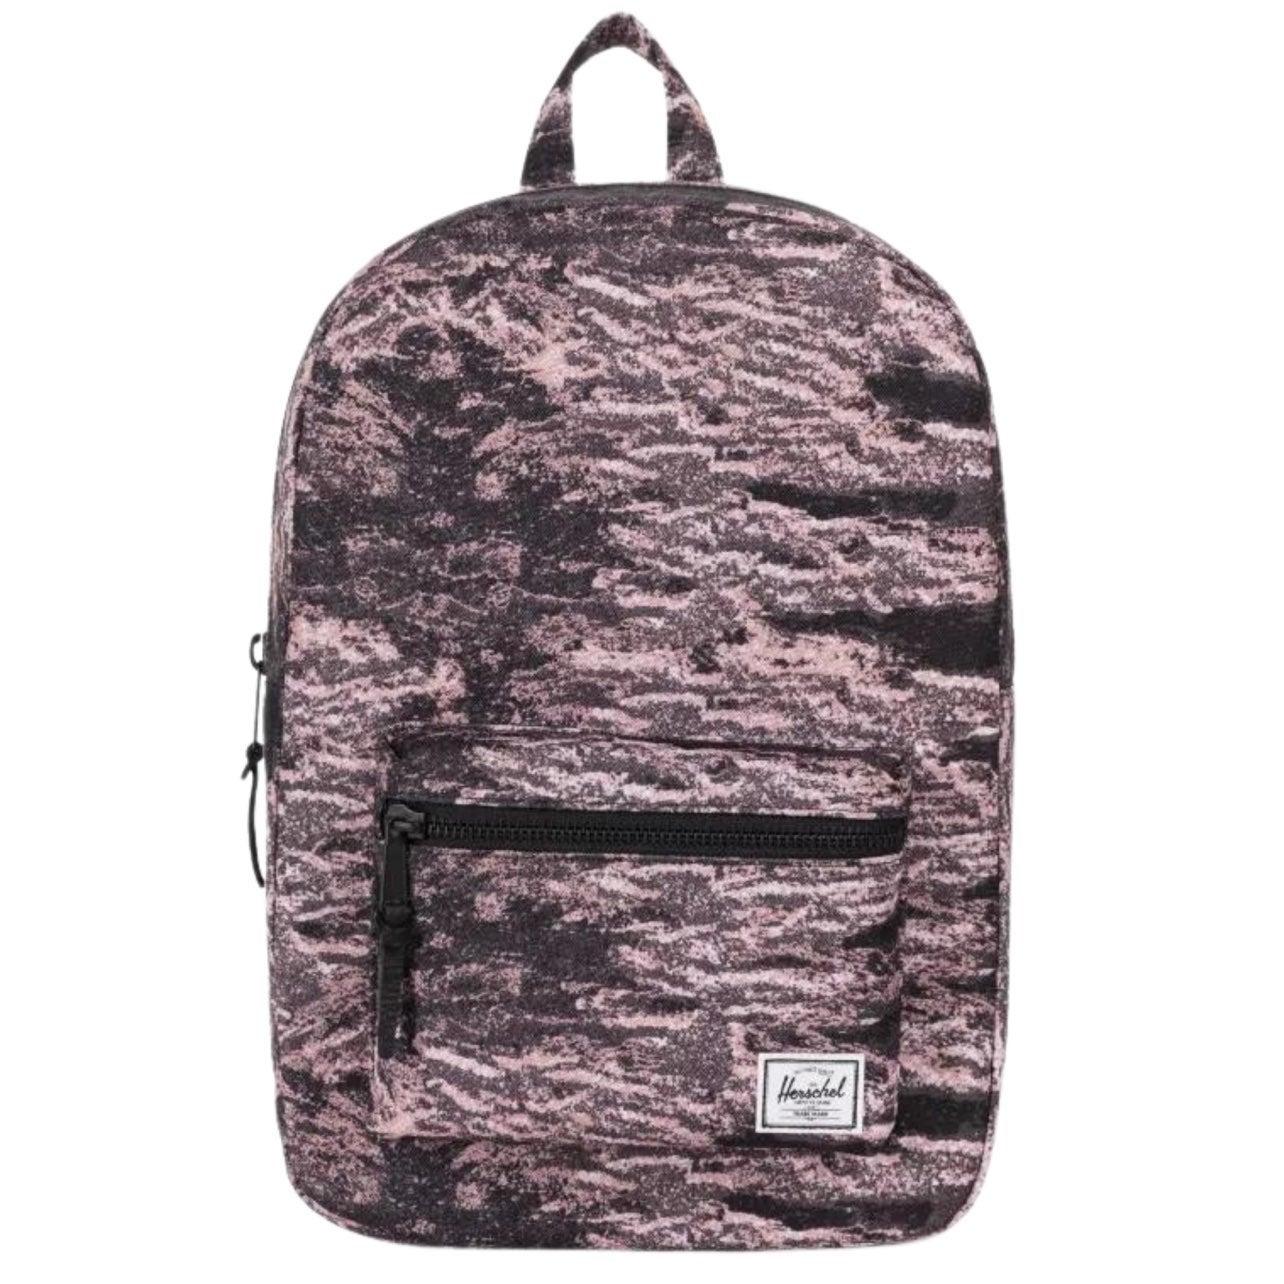 Herschel Supply Co. Ash Backpack $59.95